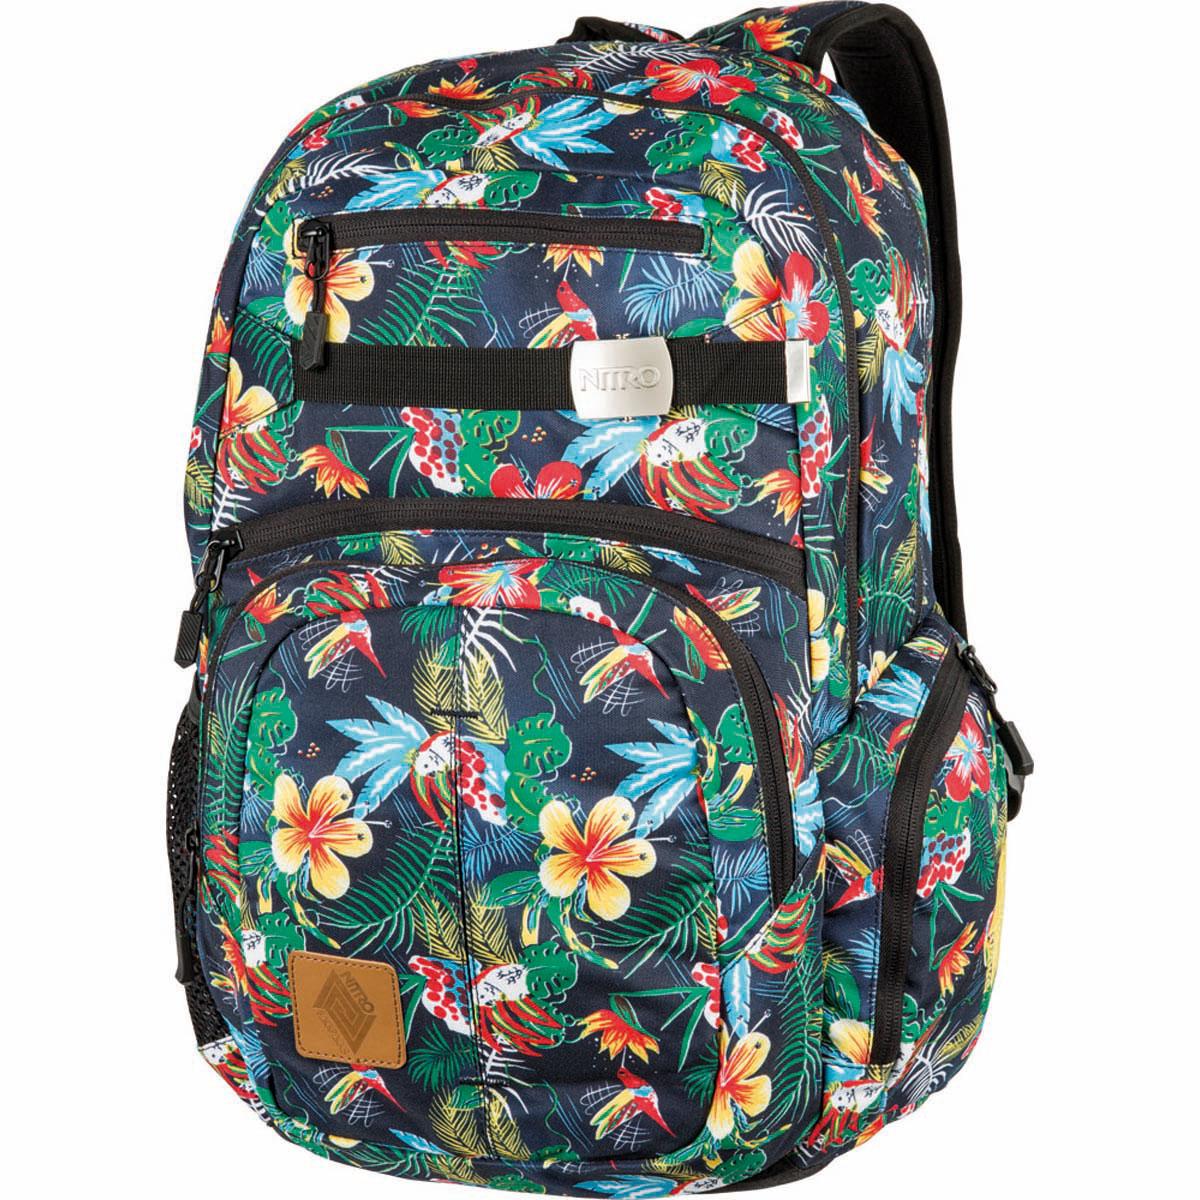 Wheelie bags for school - Nitro Hero Rucksack Paradise 37 L Nitrobags Shop Nitro Rucks 228 Cke